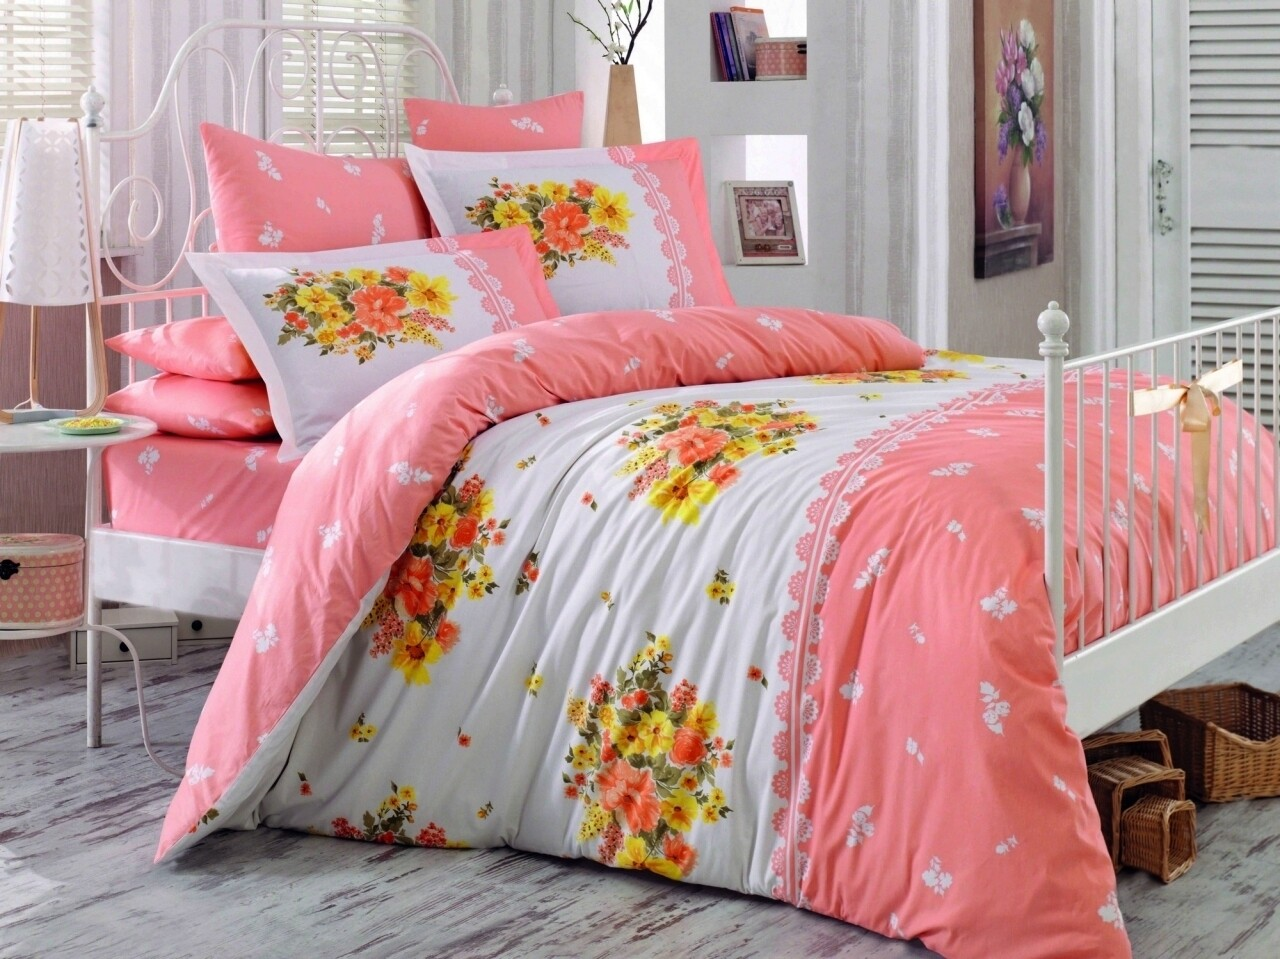 Lenjerie de pat pentru o persoana, 3 piese, 100% bumbac poplin, Hobby, Alvis, somon